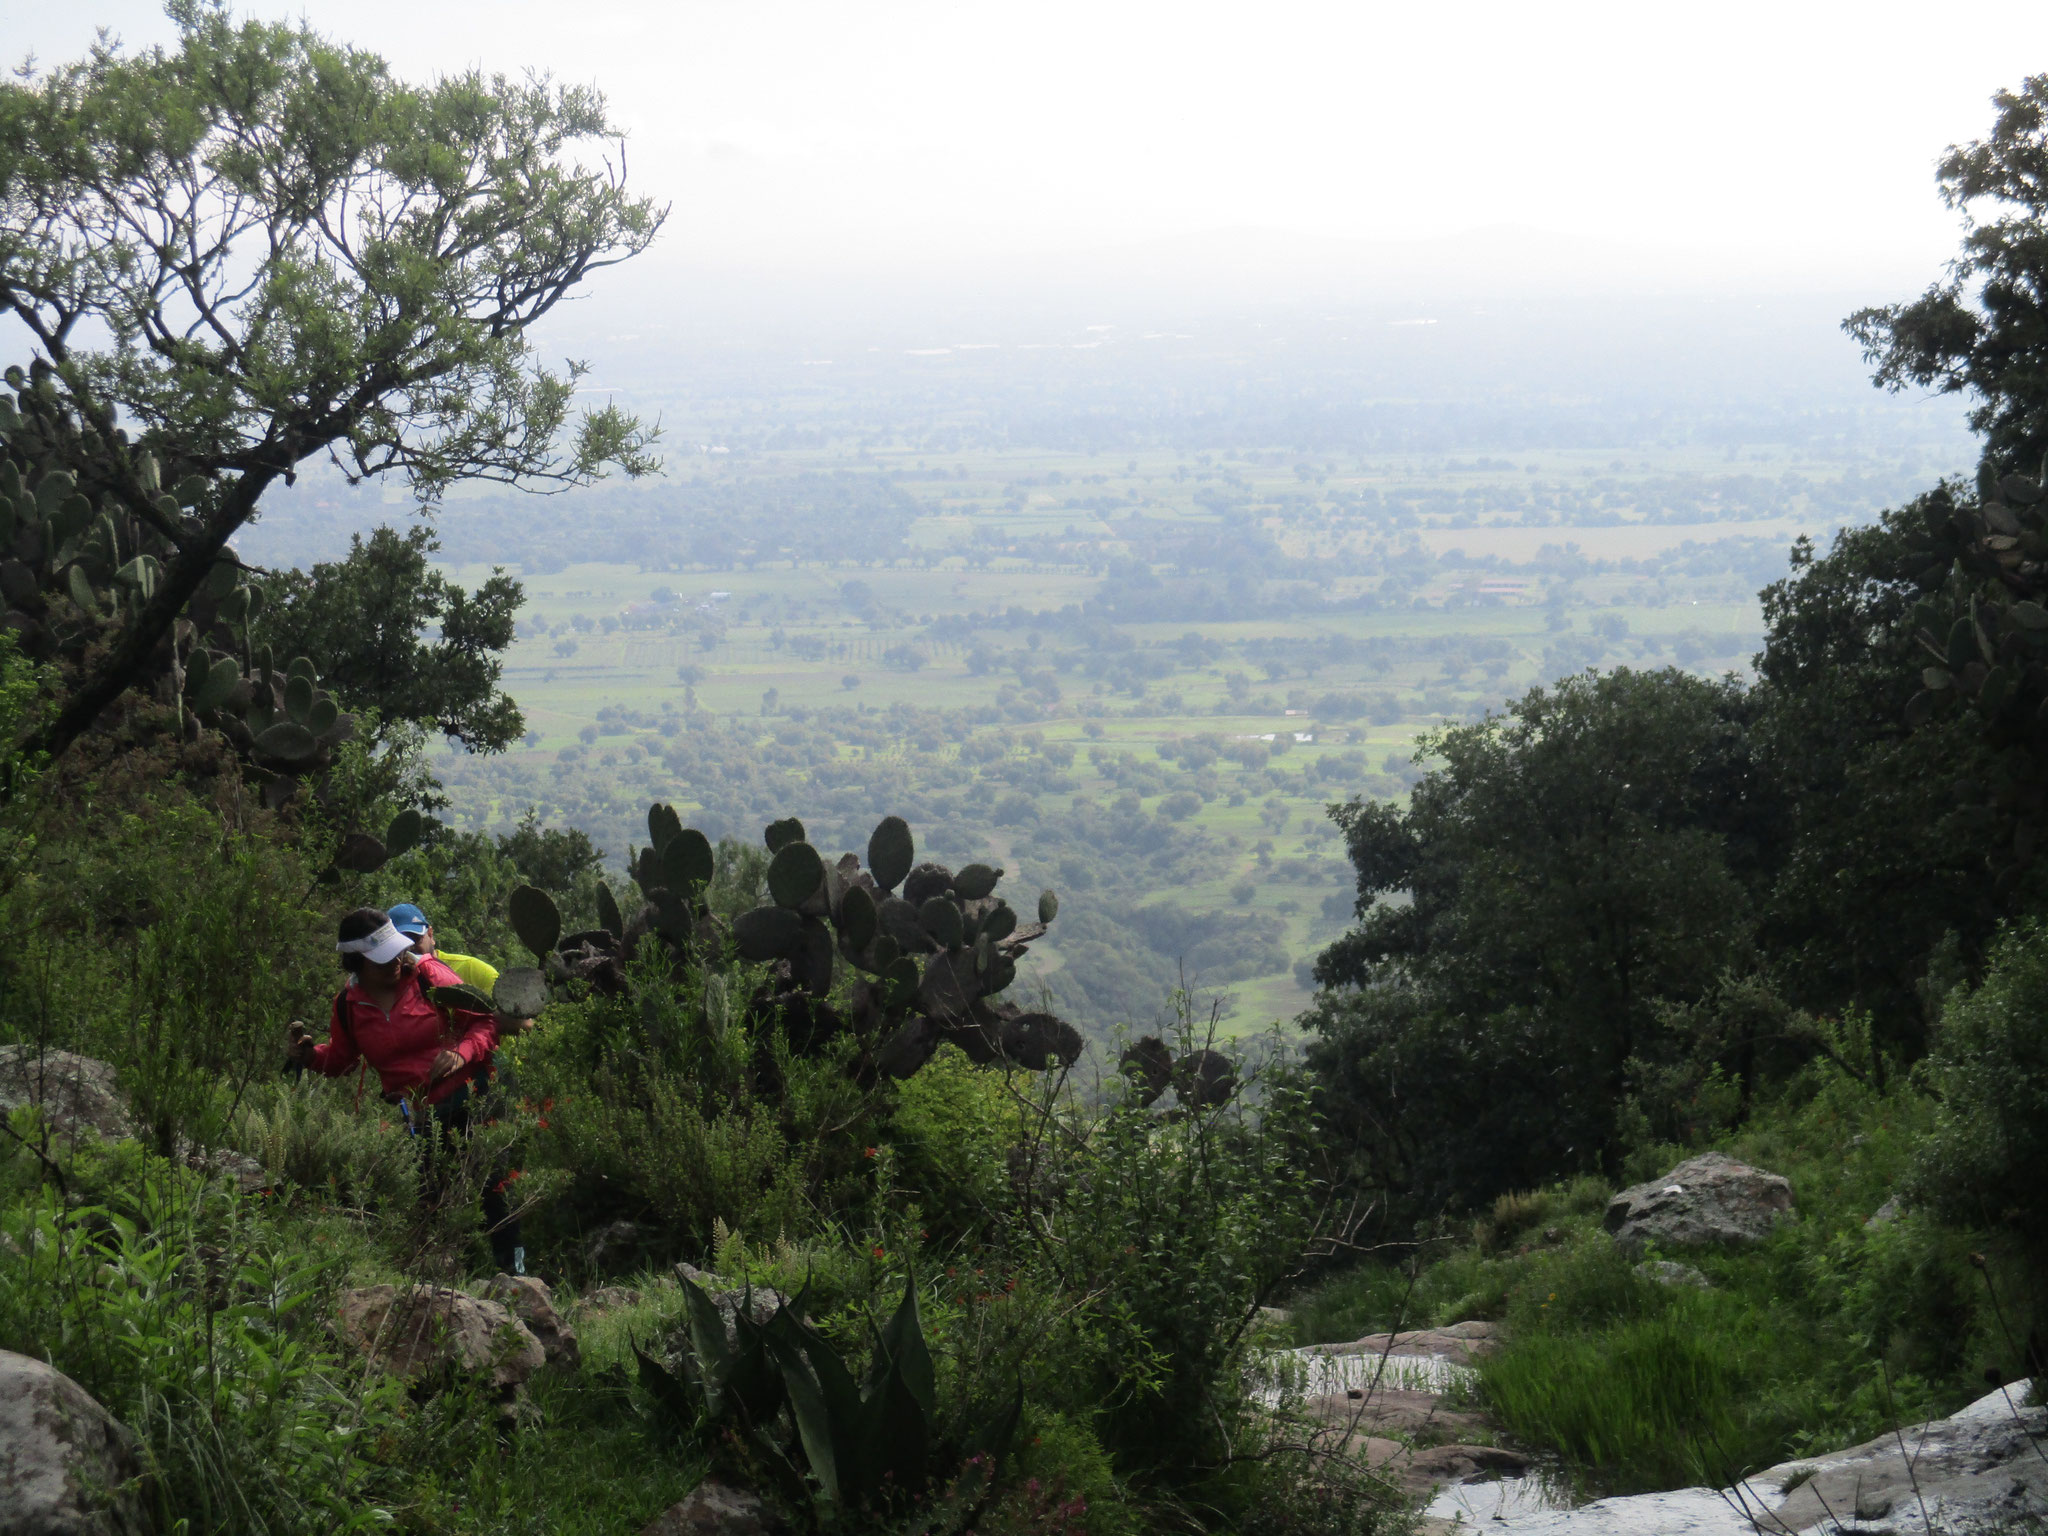 Valle de Teotihuacán